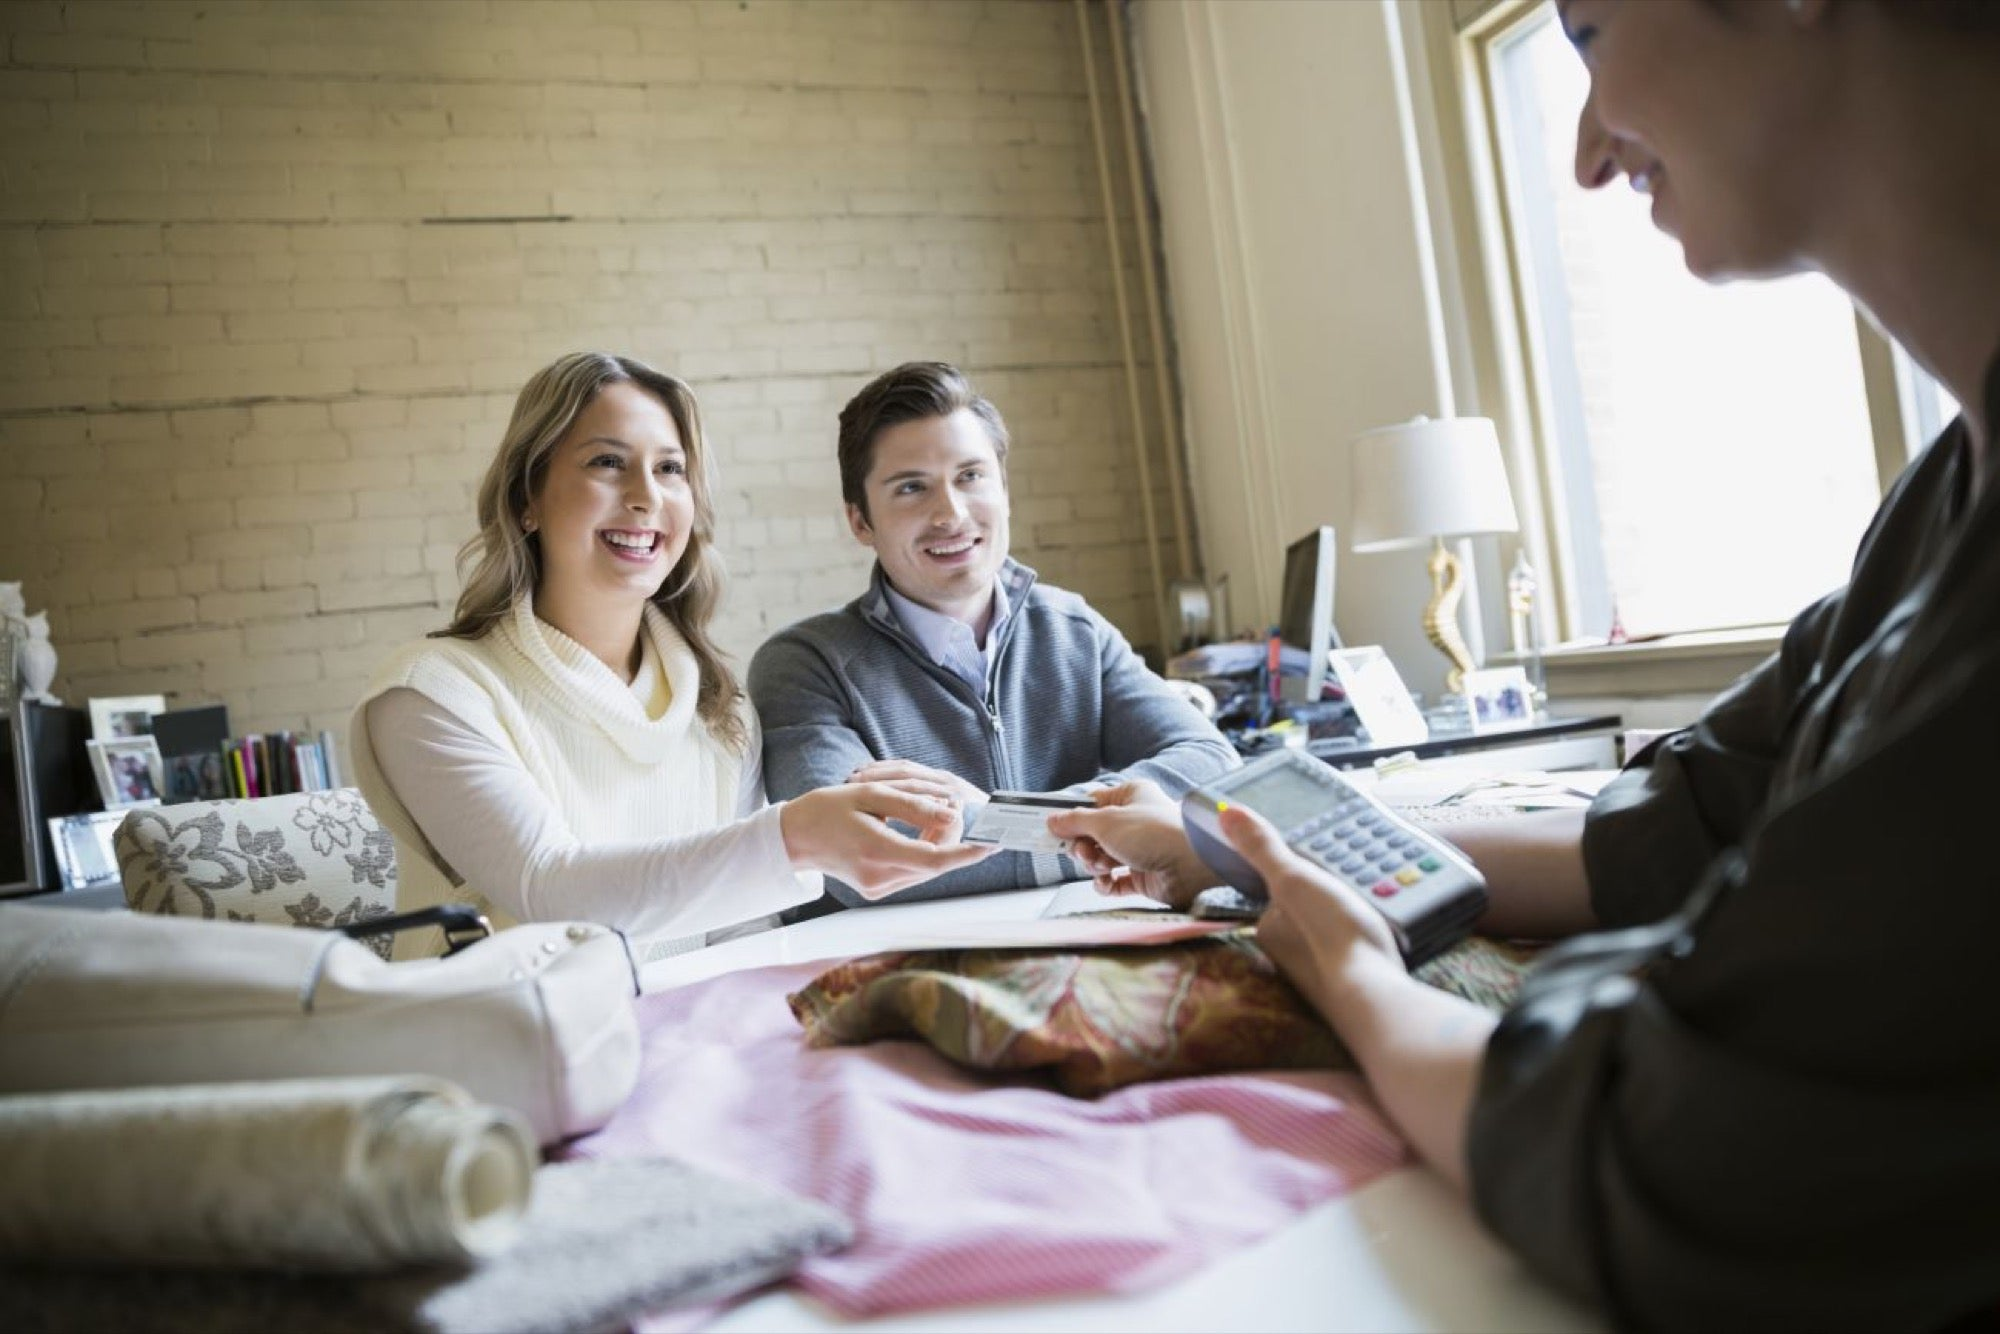 Building brand relationships online dating